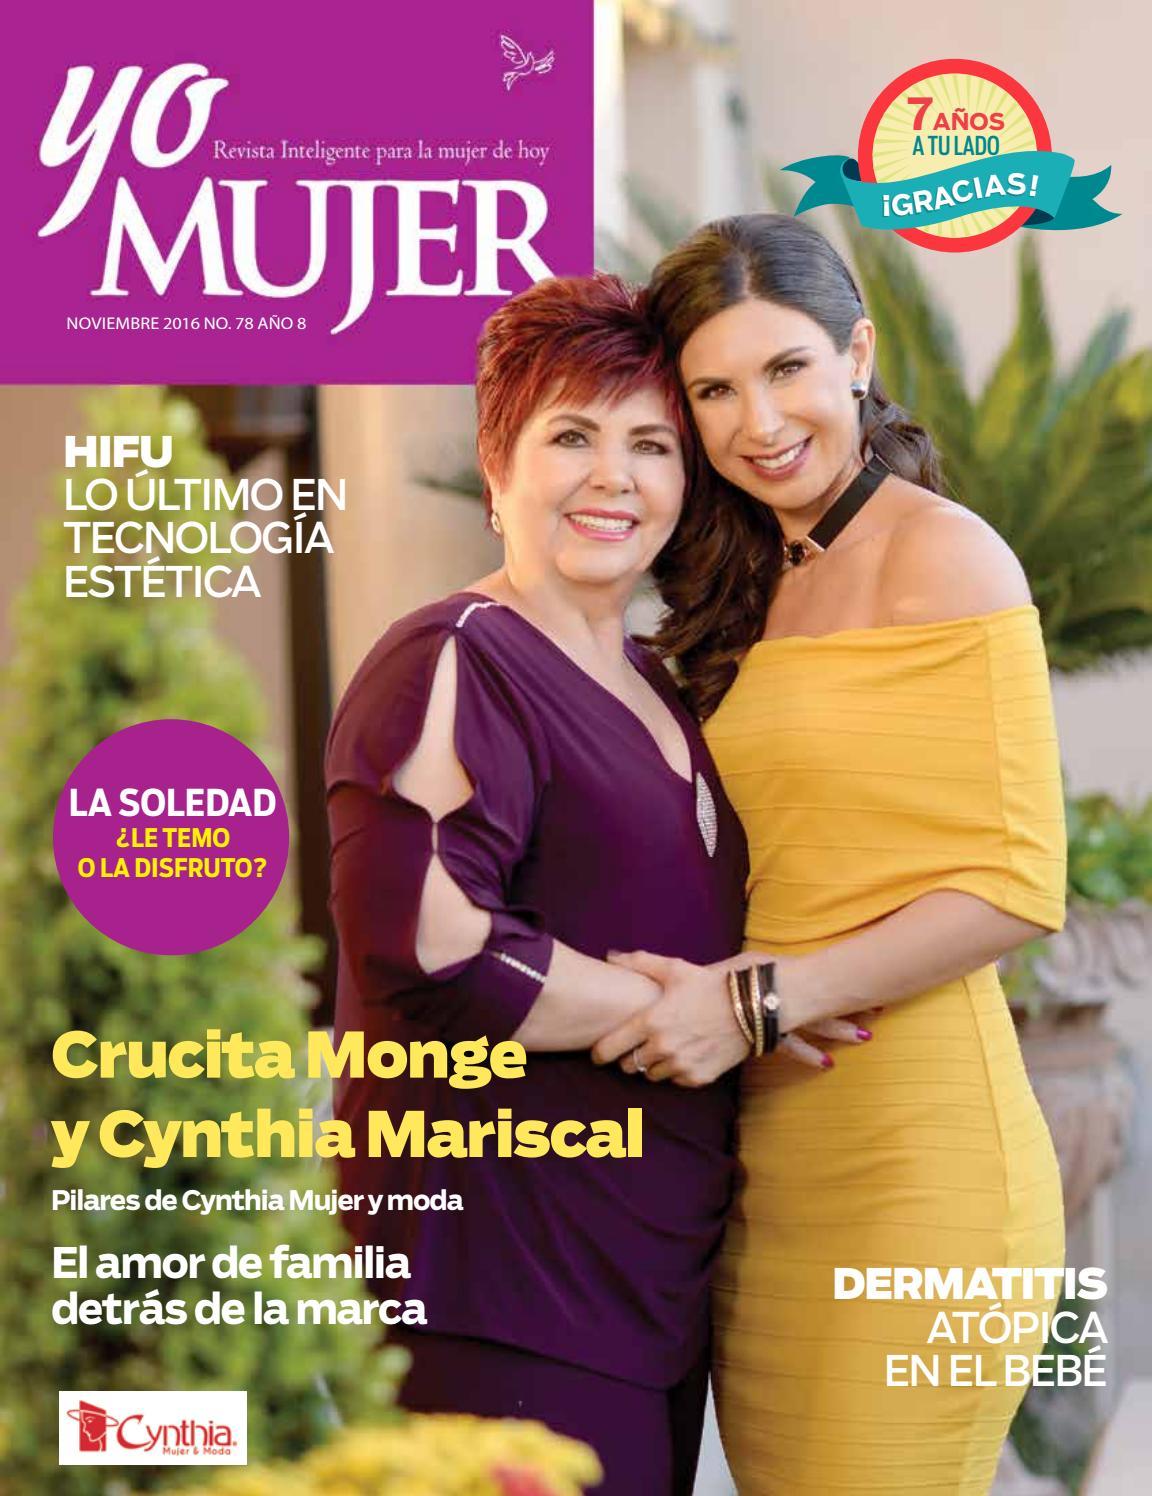 b7d68b82c471 Noviembre 2016 by Revistayo Mujer - issuu